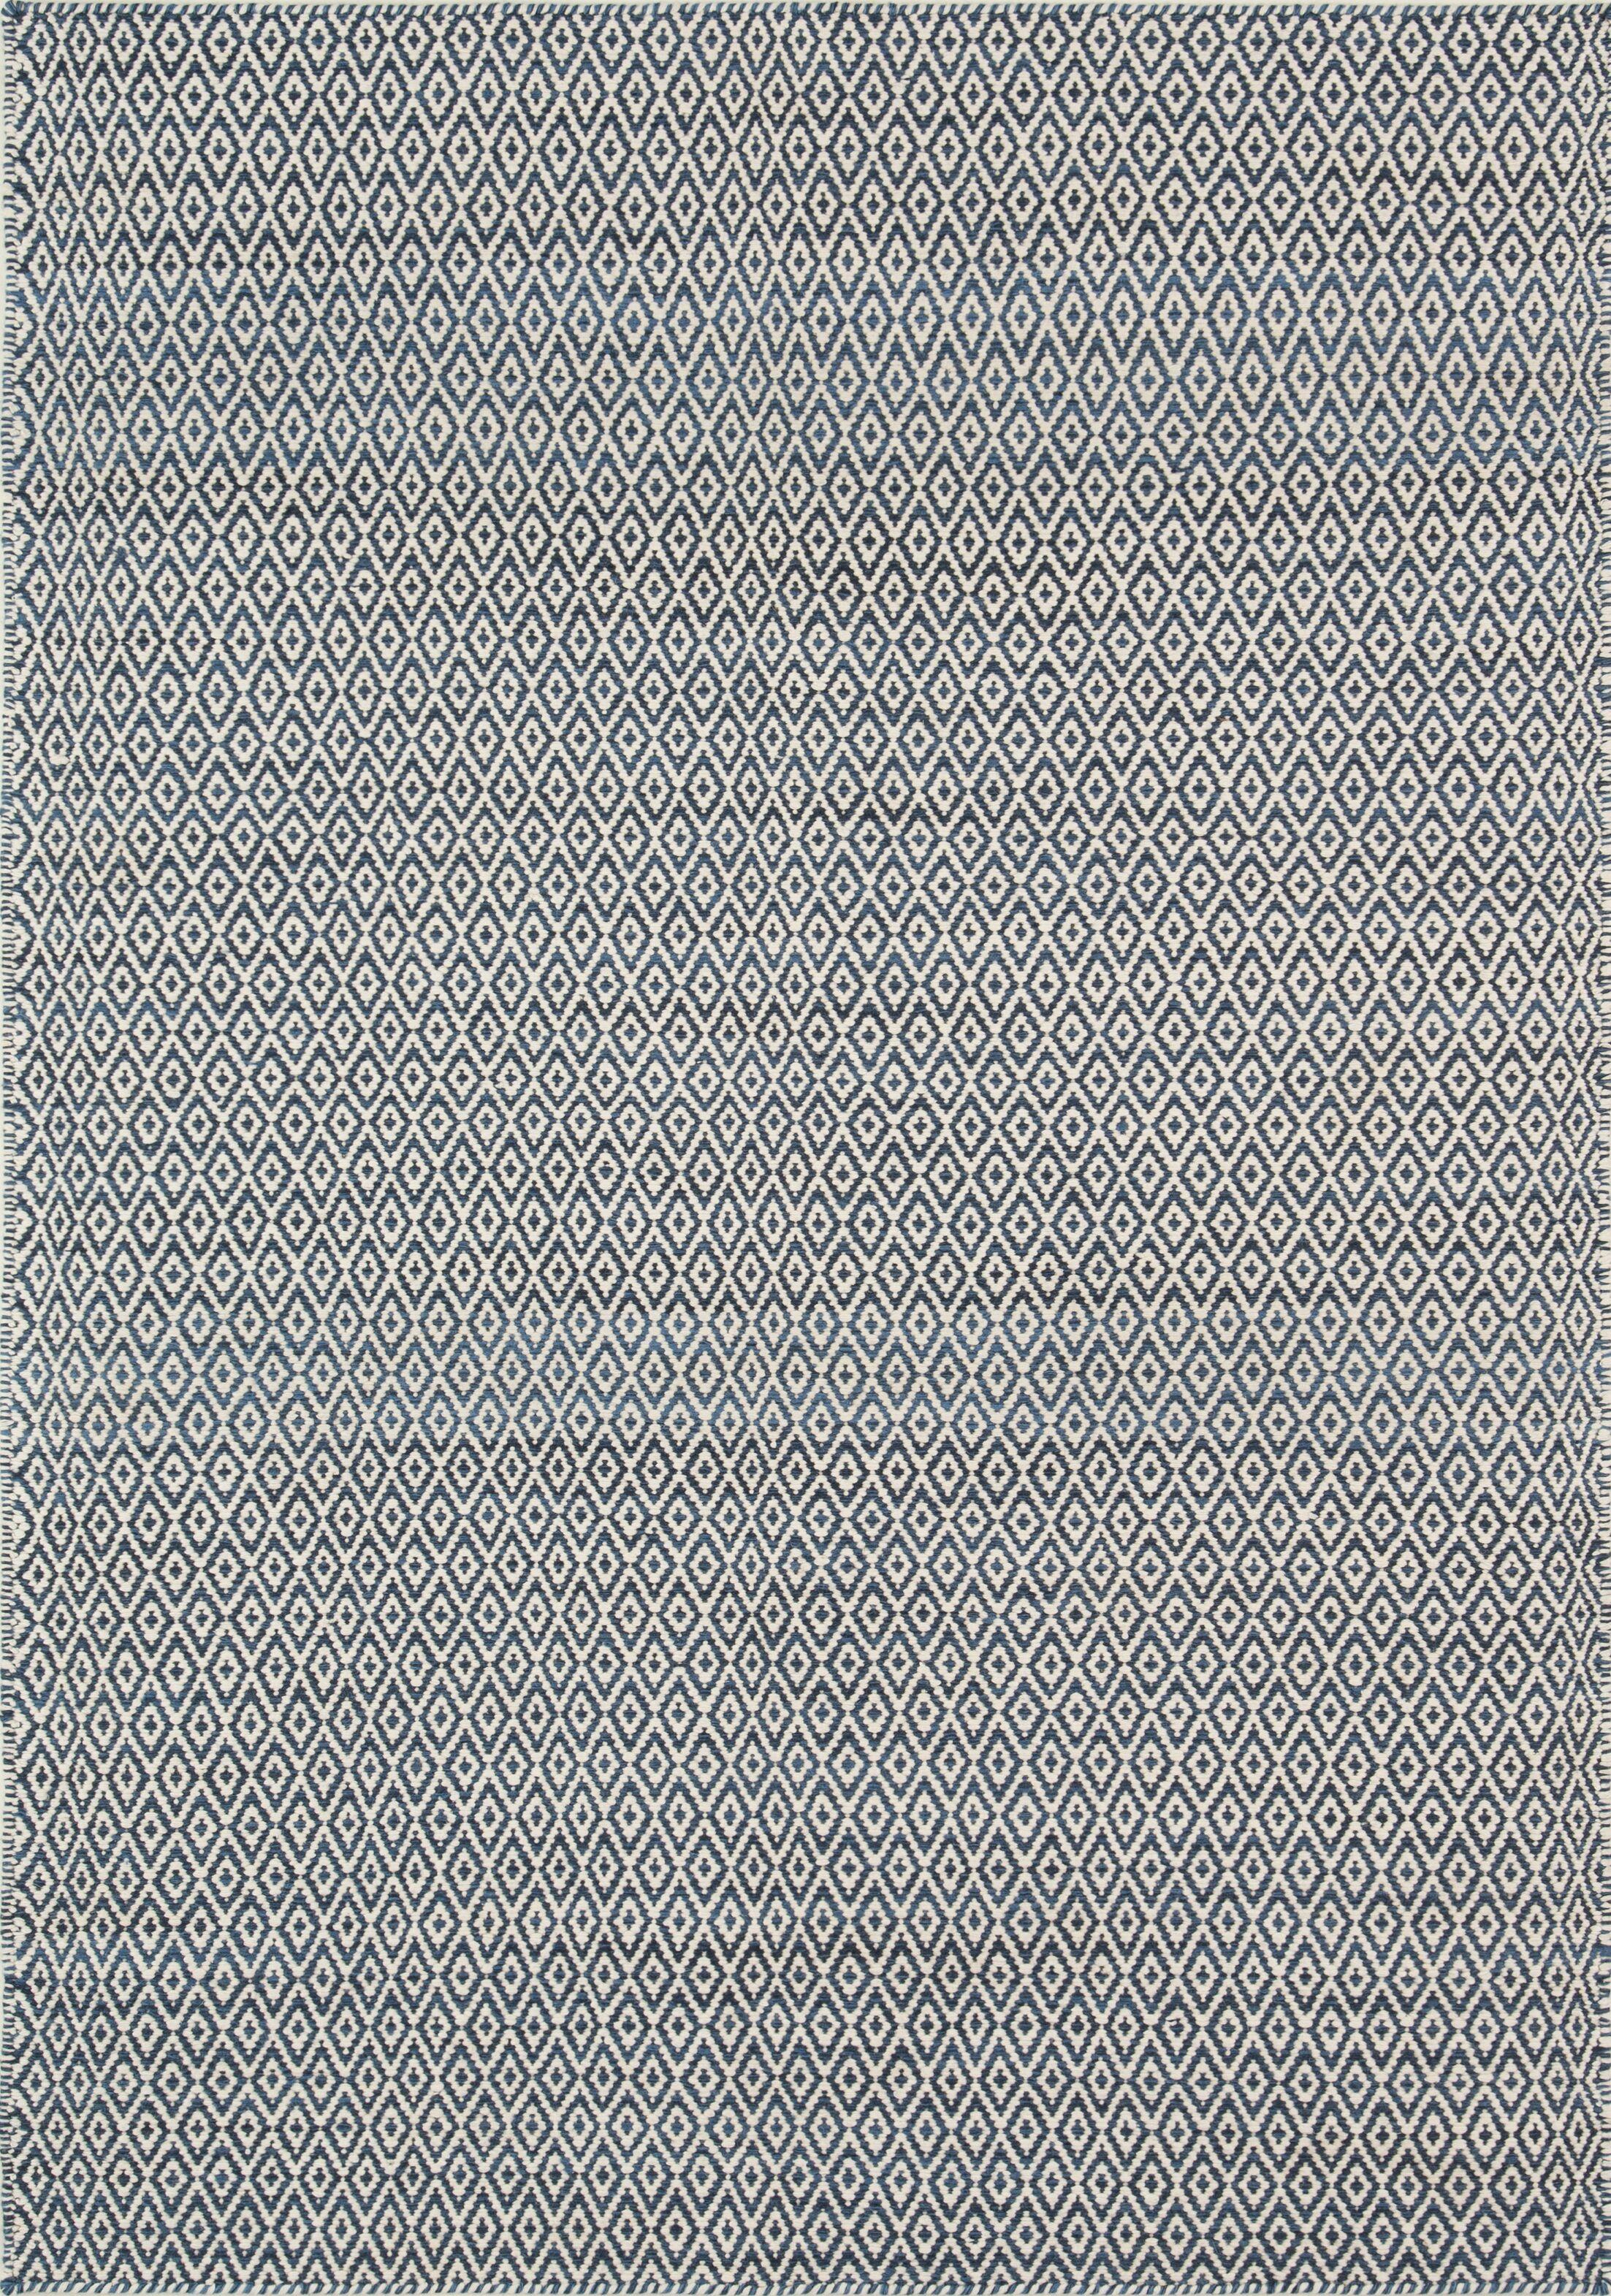 Brooklington Handwoven  Flatweave Wool Blue Area Rug Rug Size: Rectangle 3'6